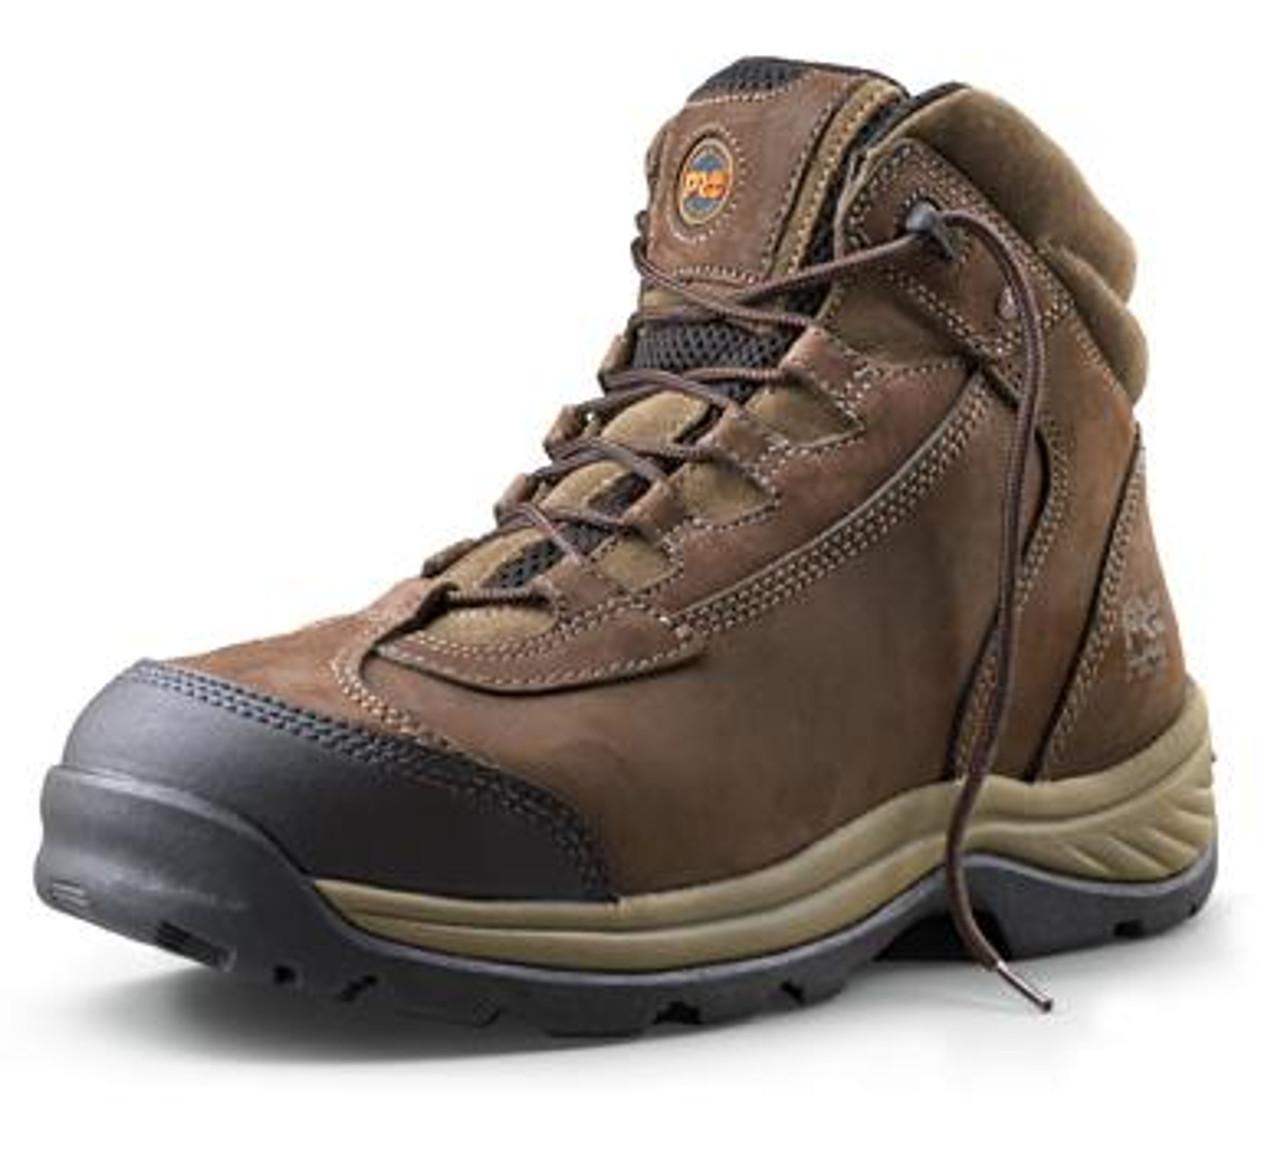 237dc4449f0 Men's Timberland PRO Ratchet CSA Hiking Boot FREE SHIPPING